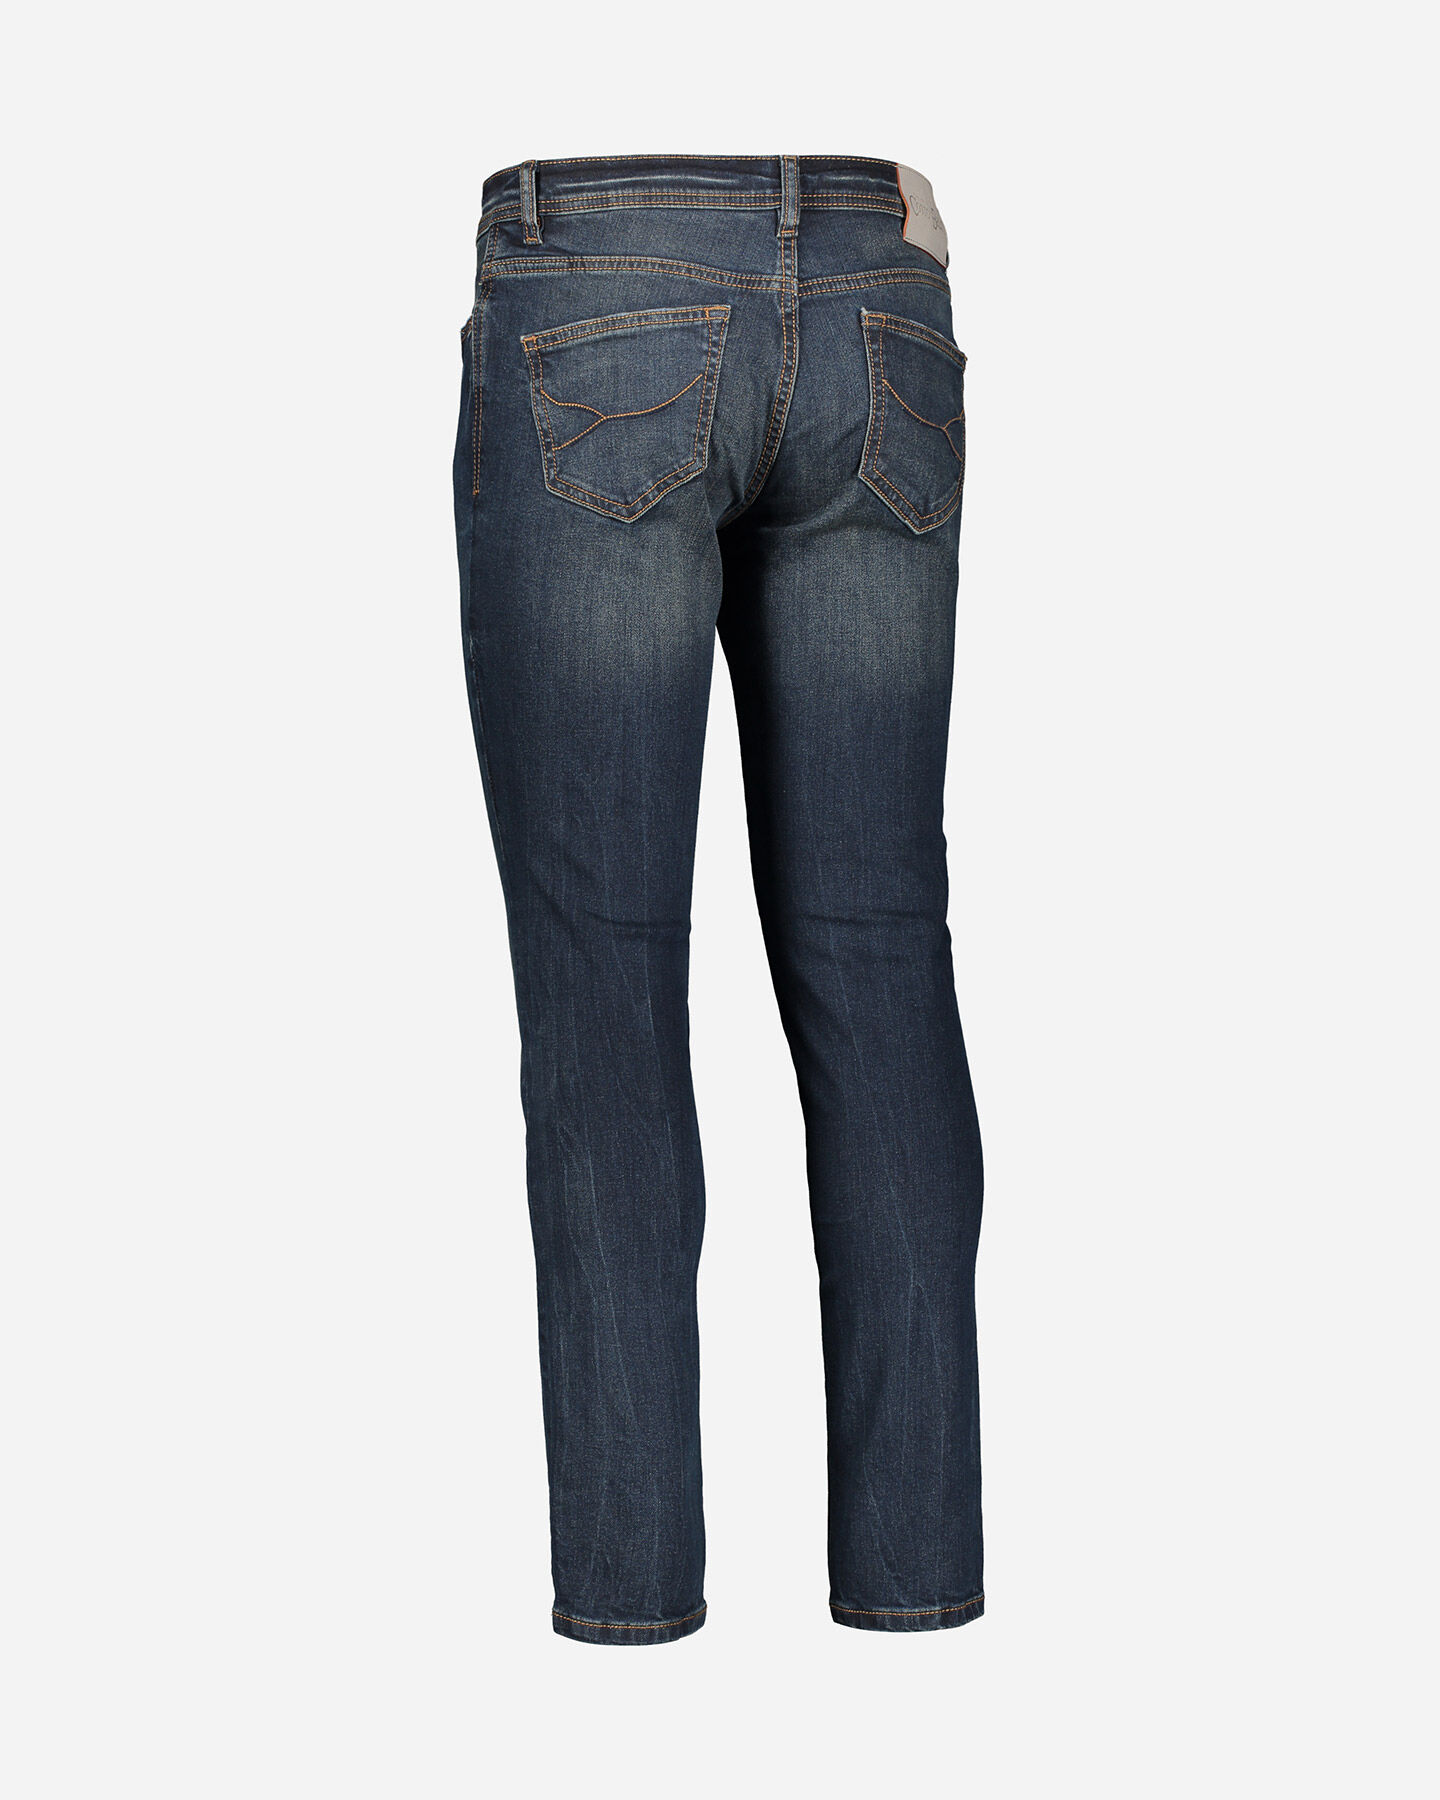 Jeans COTTON BELT GREGOR SLIM M S4070912 scatto 6